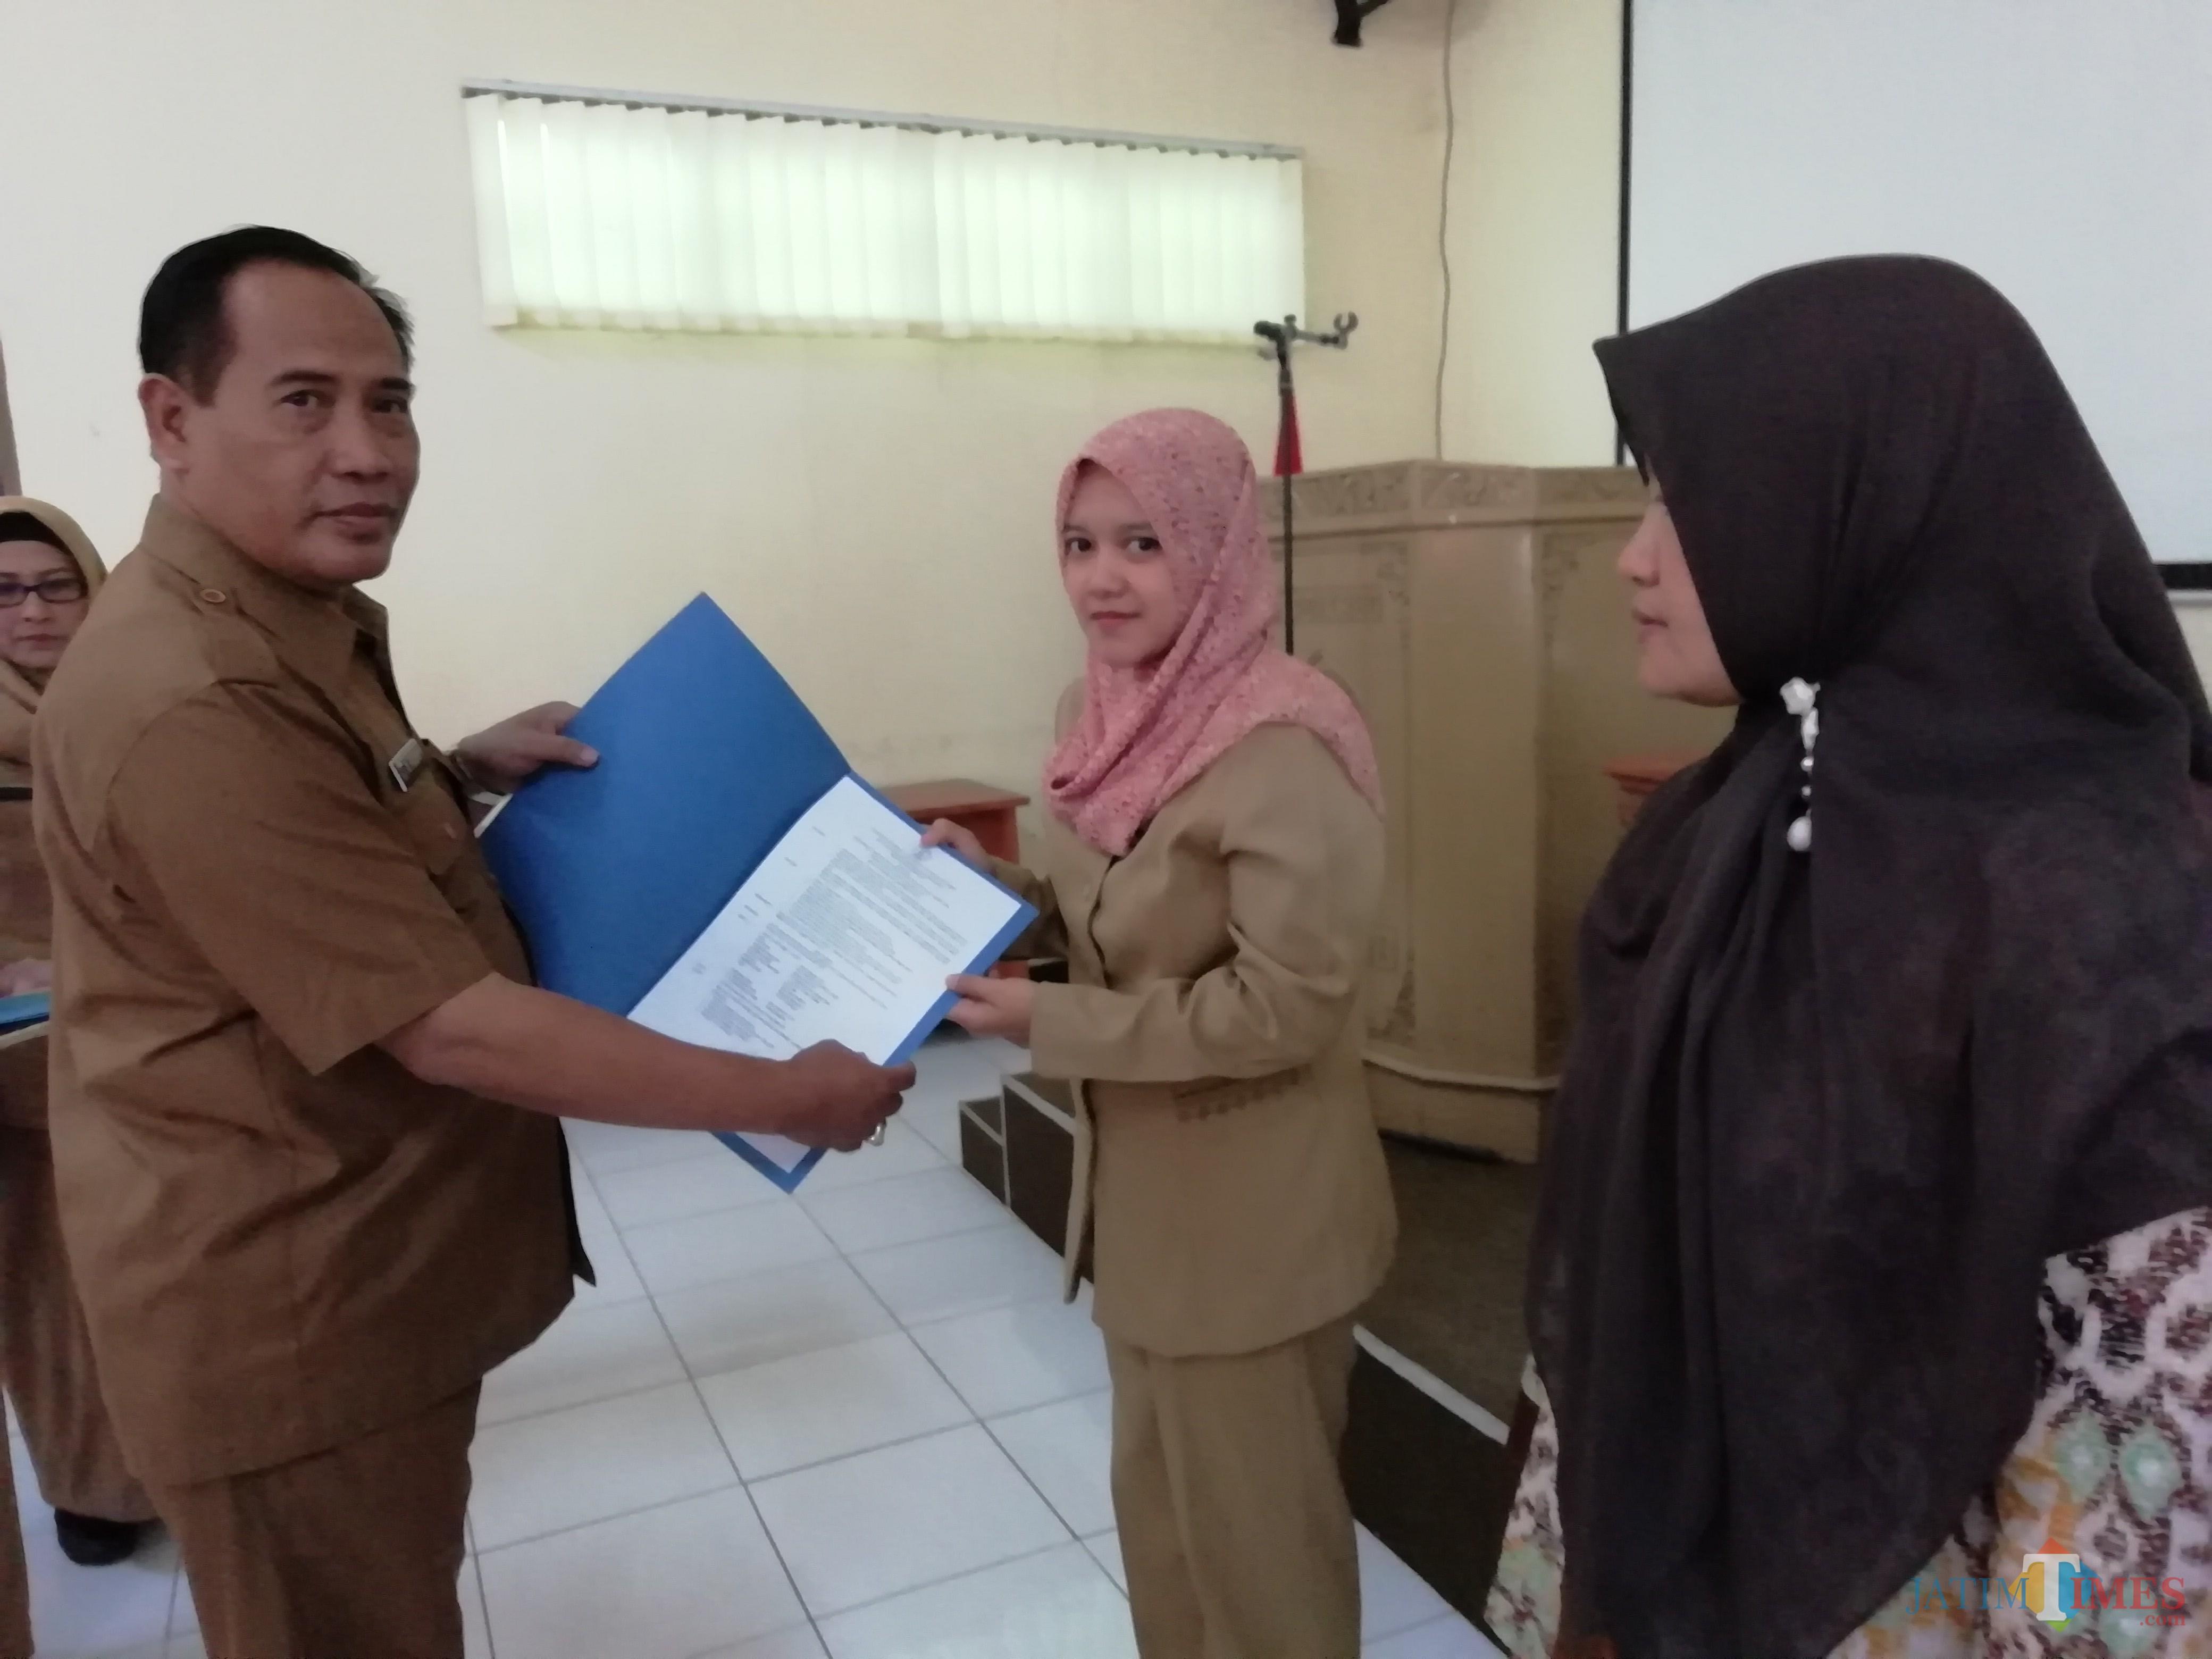 Kepala Dinas Pendidikan Kabupaten Malang M. Hidayat saat menyerahkan secara simbolis SK penyetaraan guru non-PNS, Selasa (25/06/2019). (Nana)